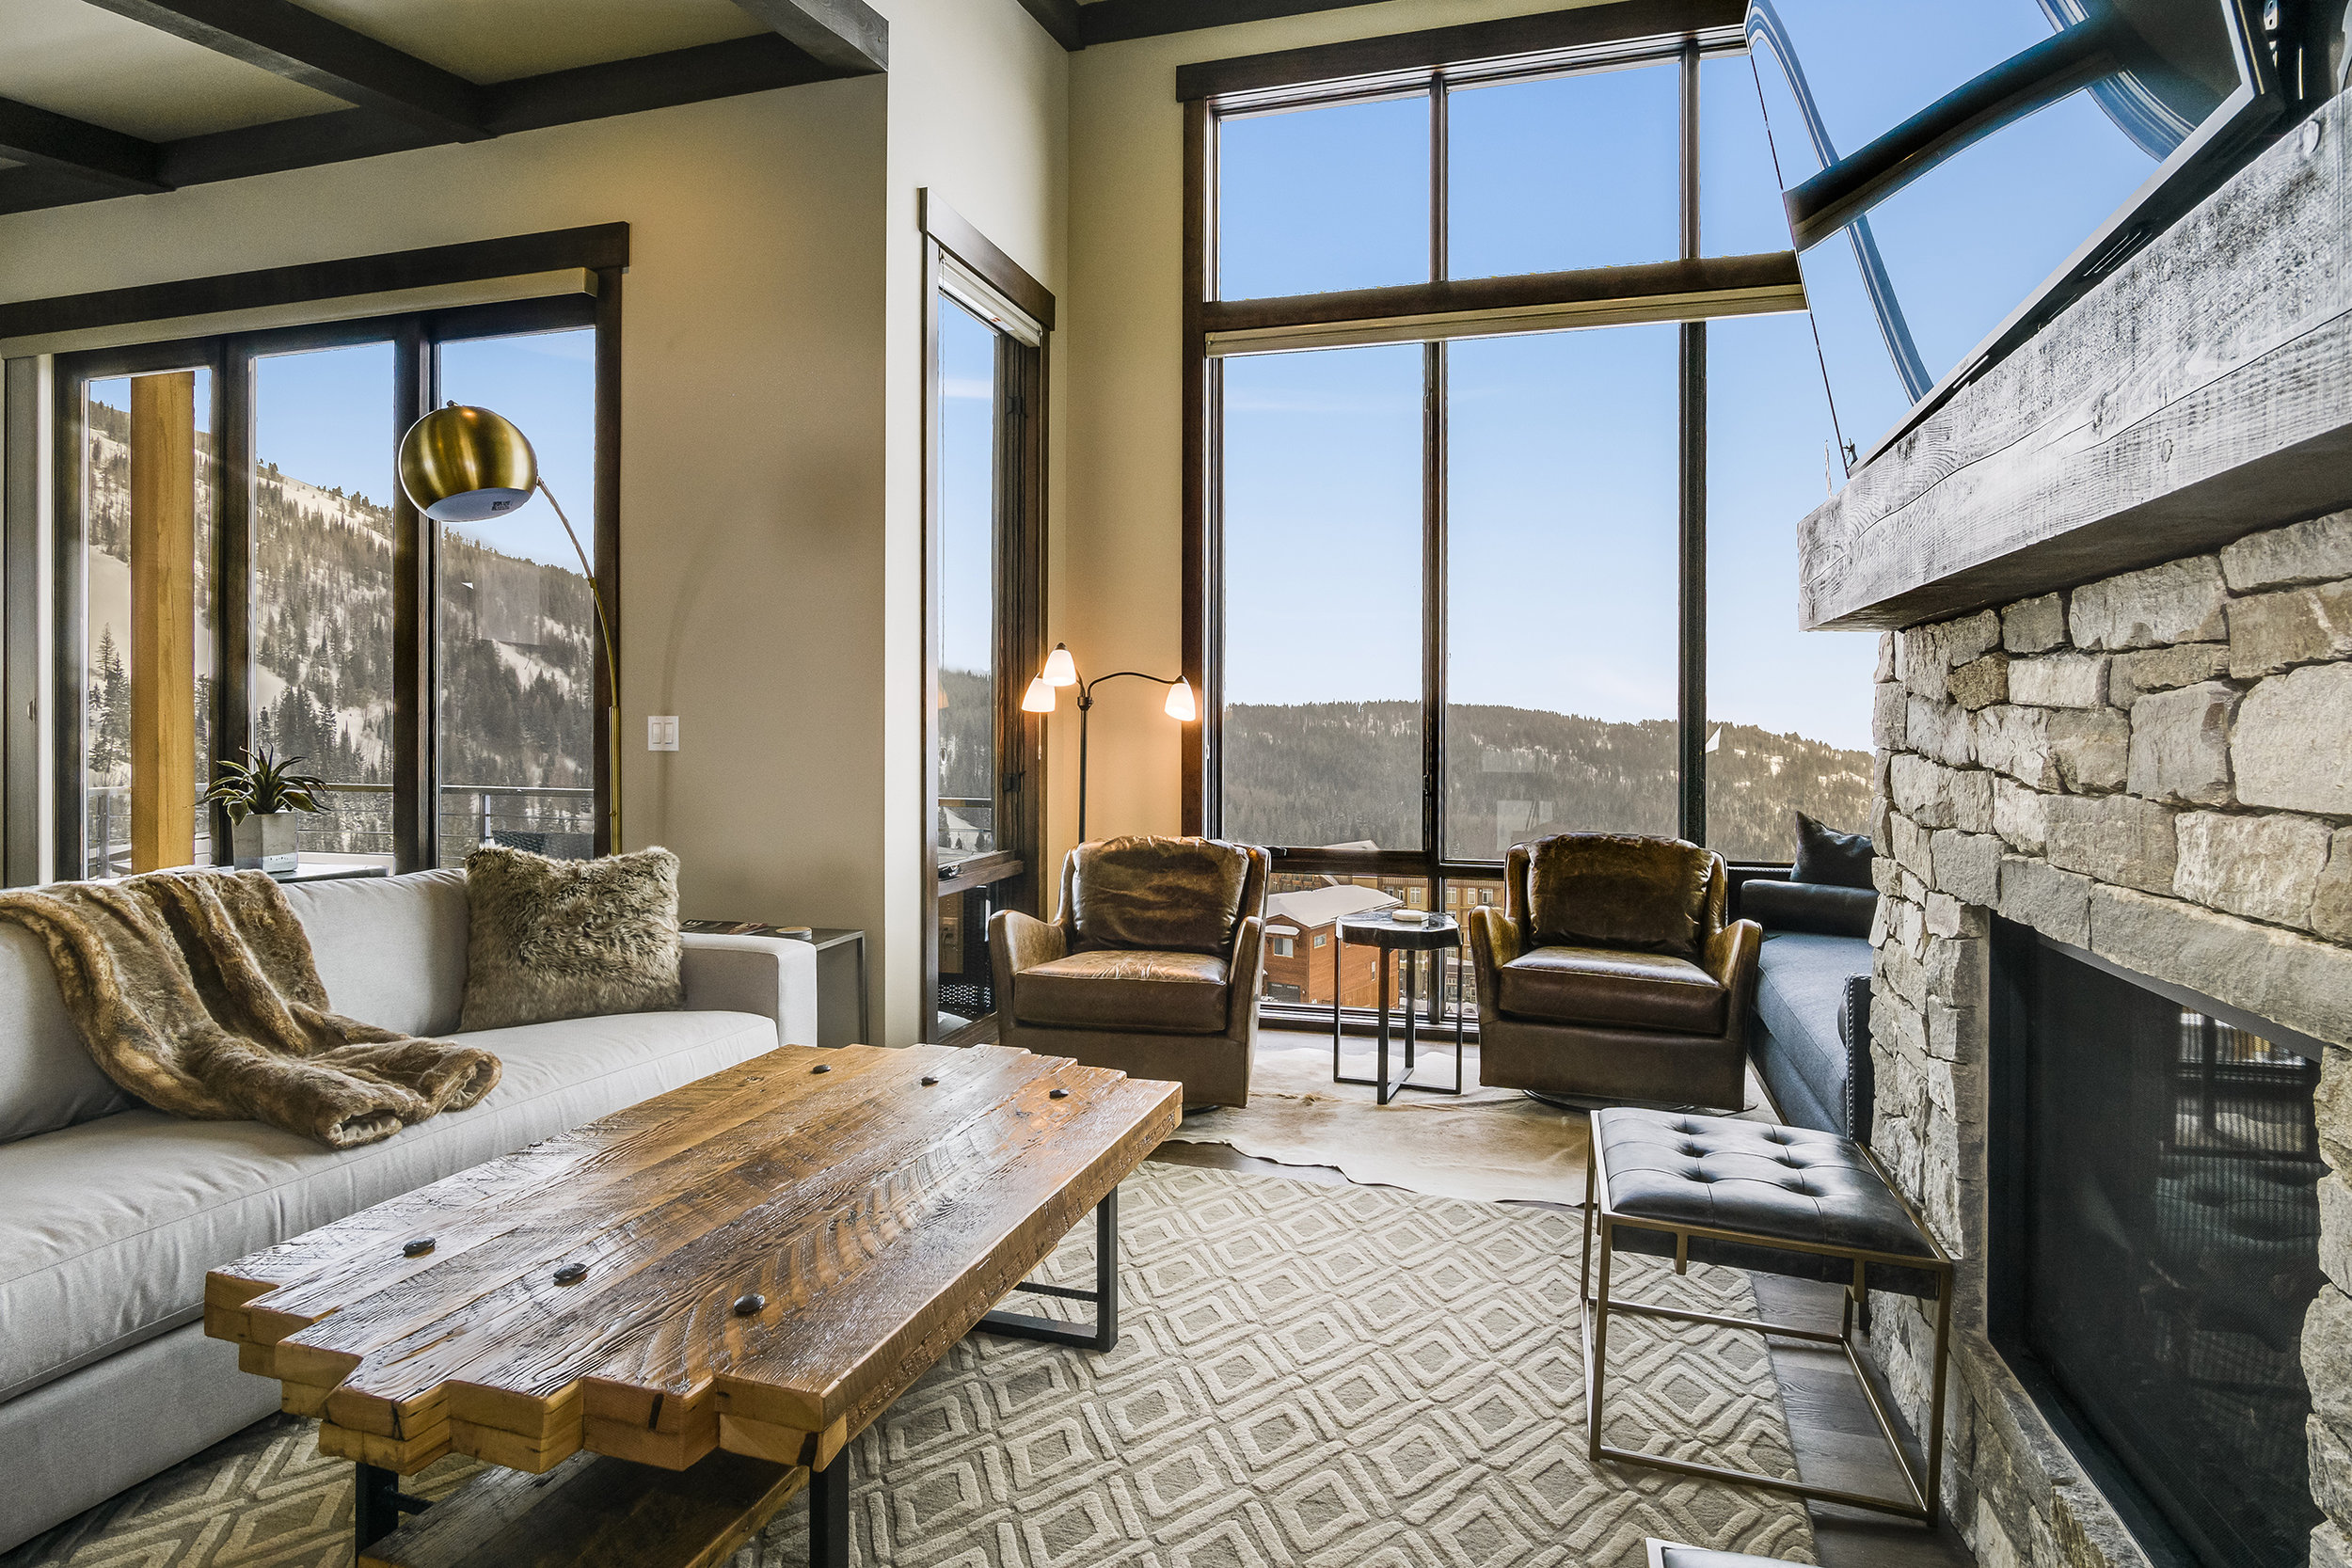 Headwall-Interiors-Windows-View-Fireplace.jpg